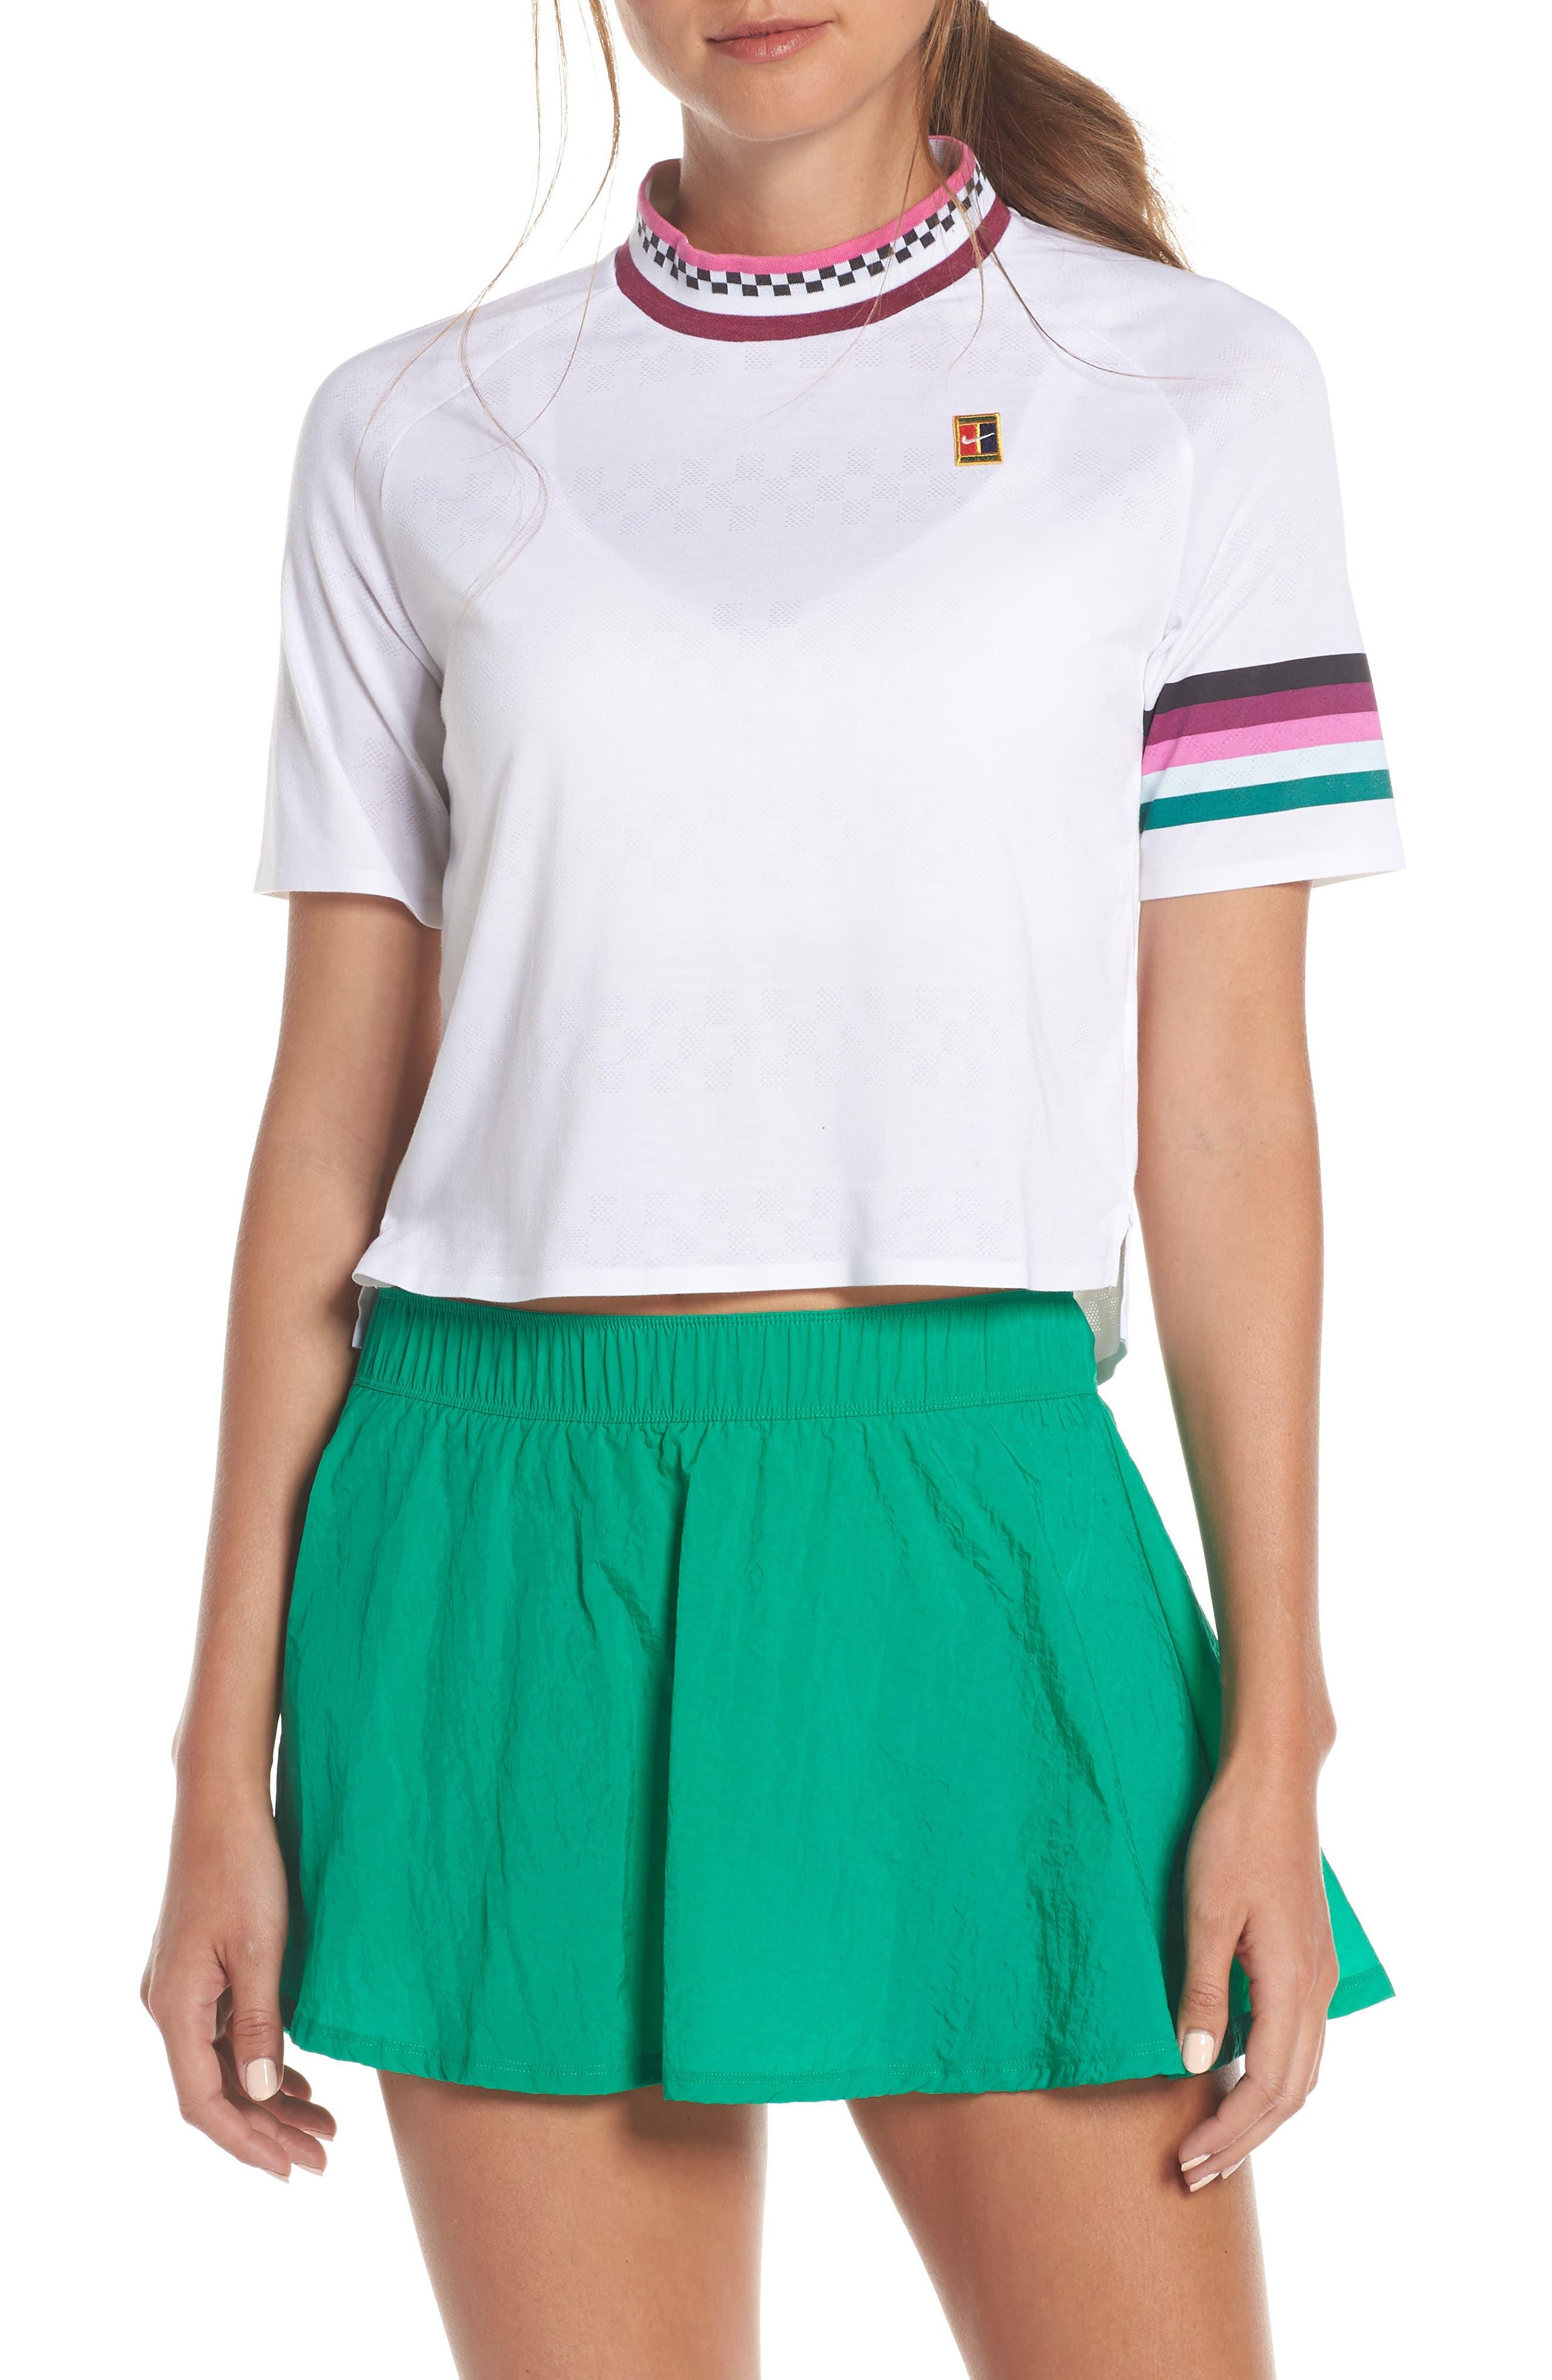 NIKE,                             Dry Breathe Tennis Top,                             Main thumbnail 1, color,                             WHITE/ TRUE BERRY/ GREEN